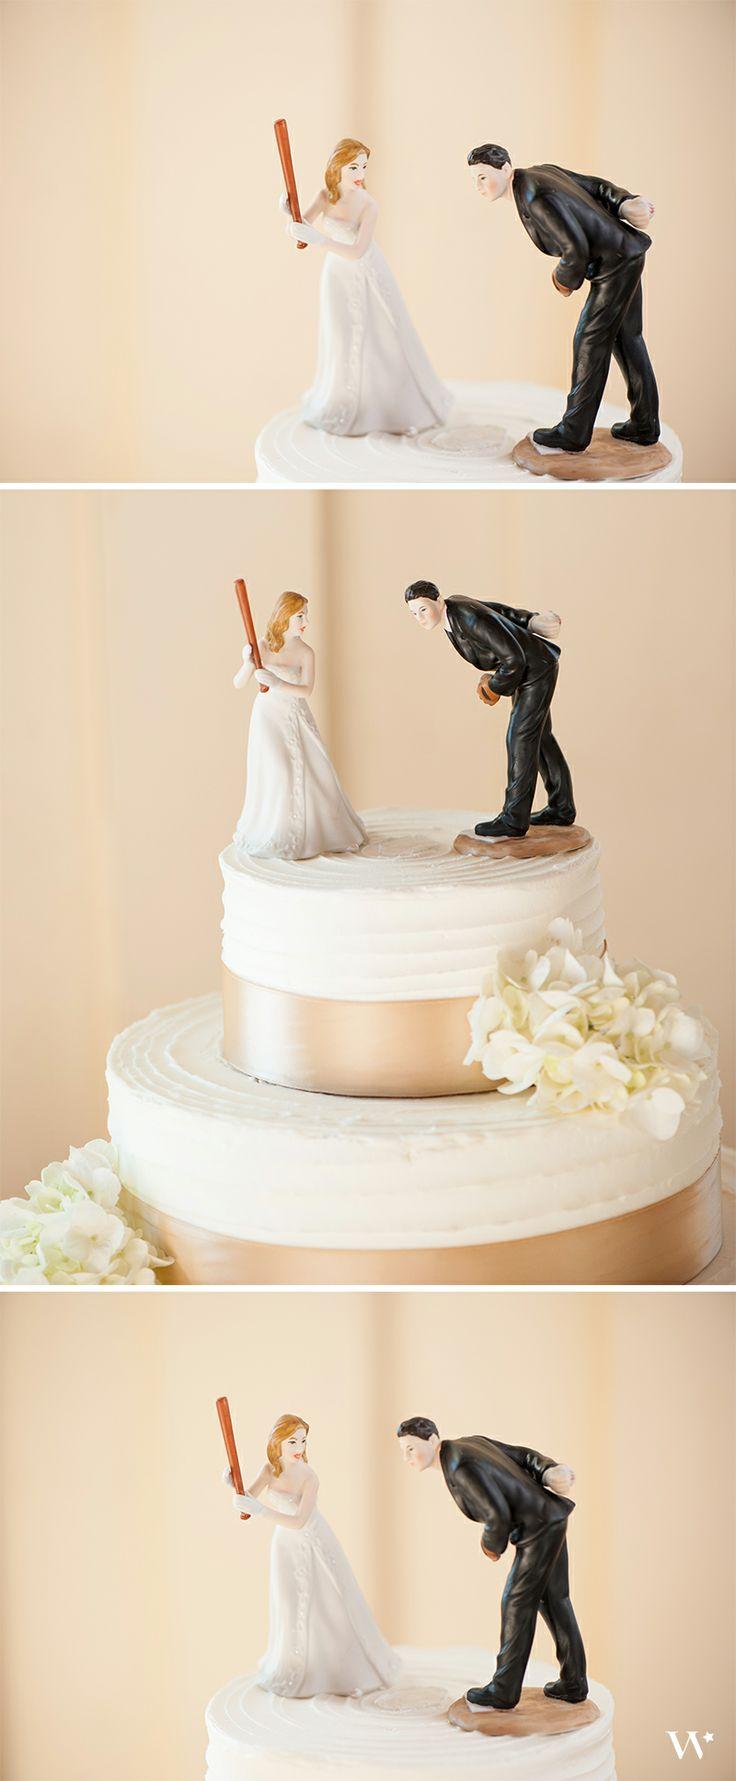 baseball wedding cake topper hit a home run